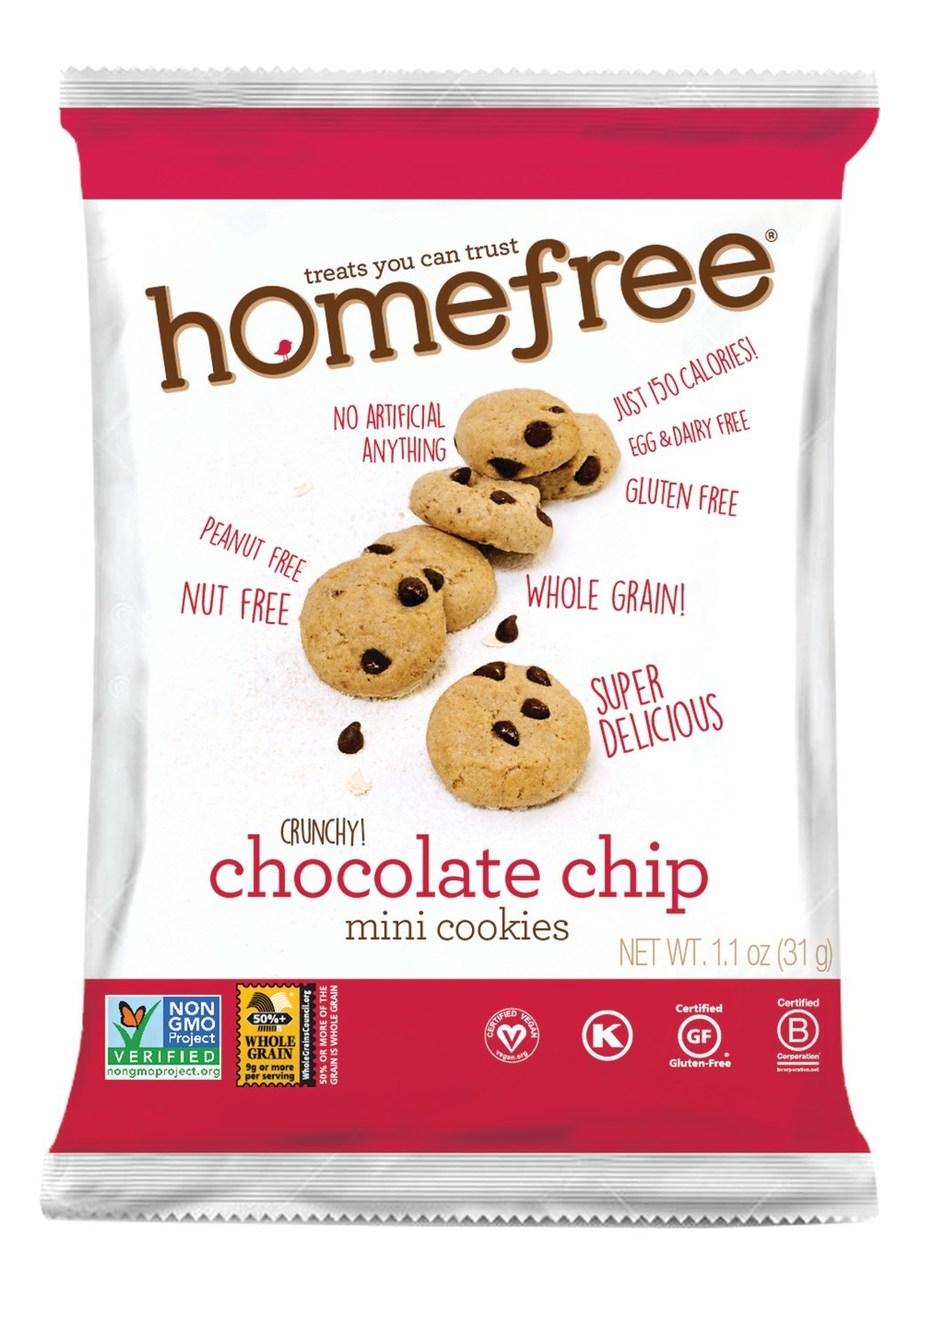 Homefree Chocolate Chip Mini Cookies